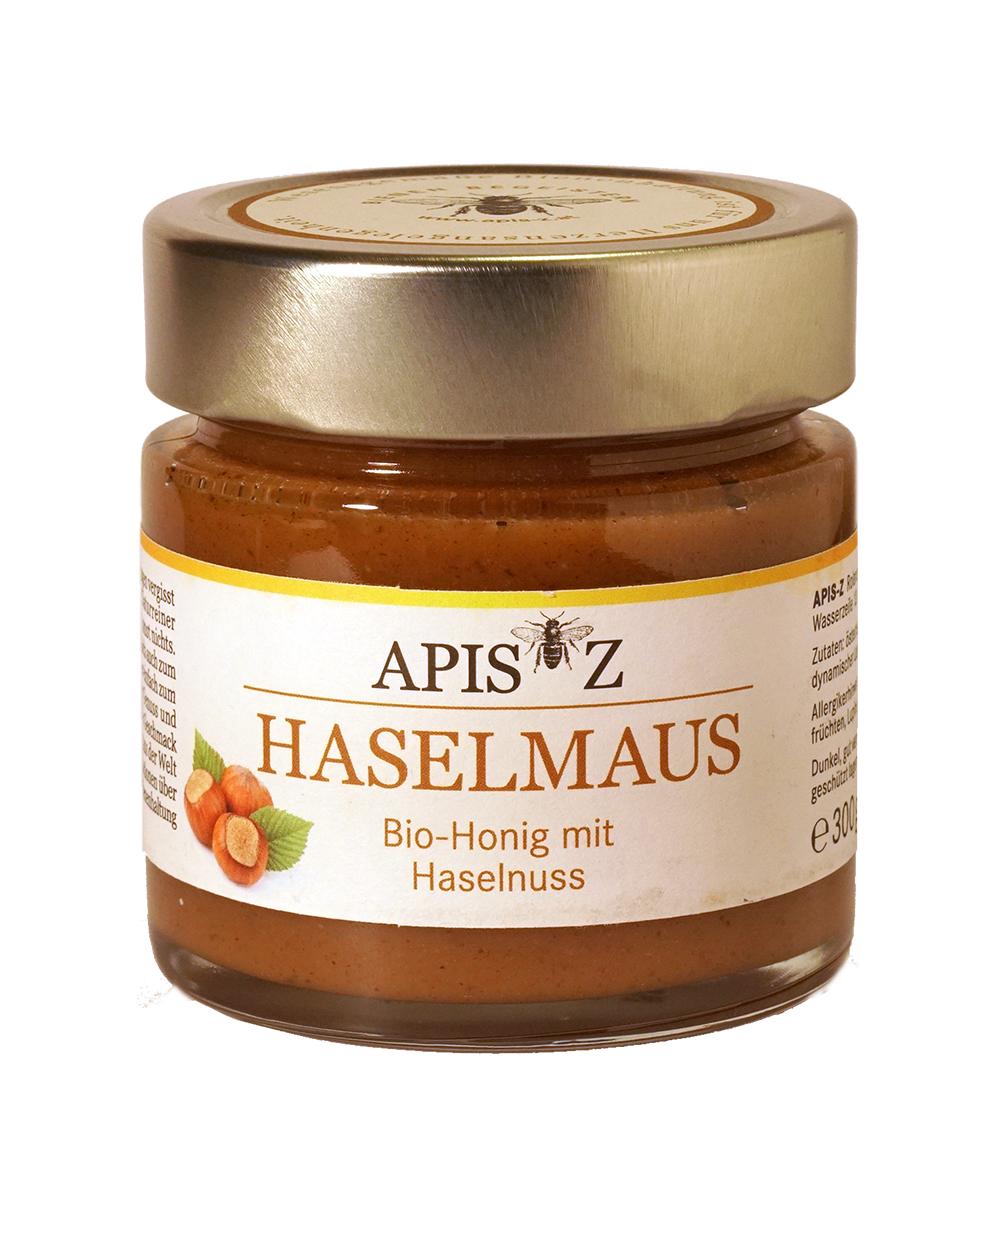 HASELMAUS Bio-Honig mit Haselnuss